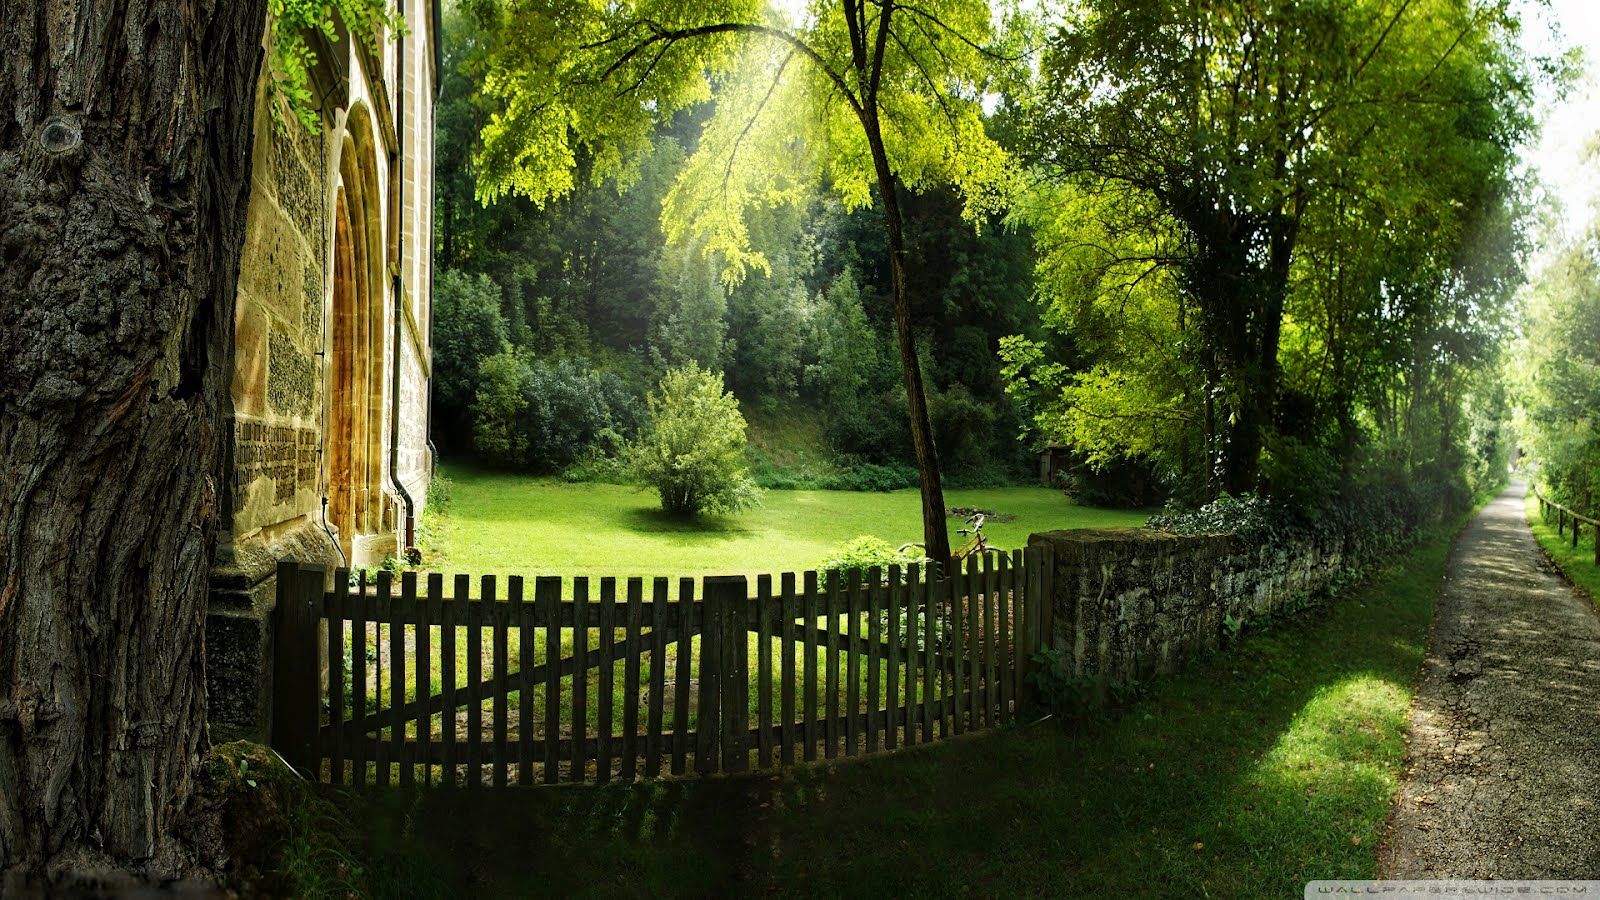 Download Summer Nature Wallpaper Full HD Wallpapers 1600x900